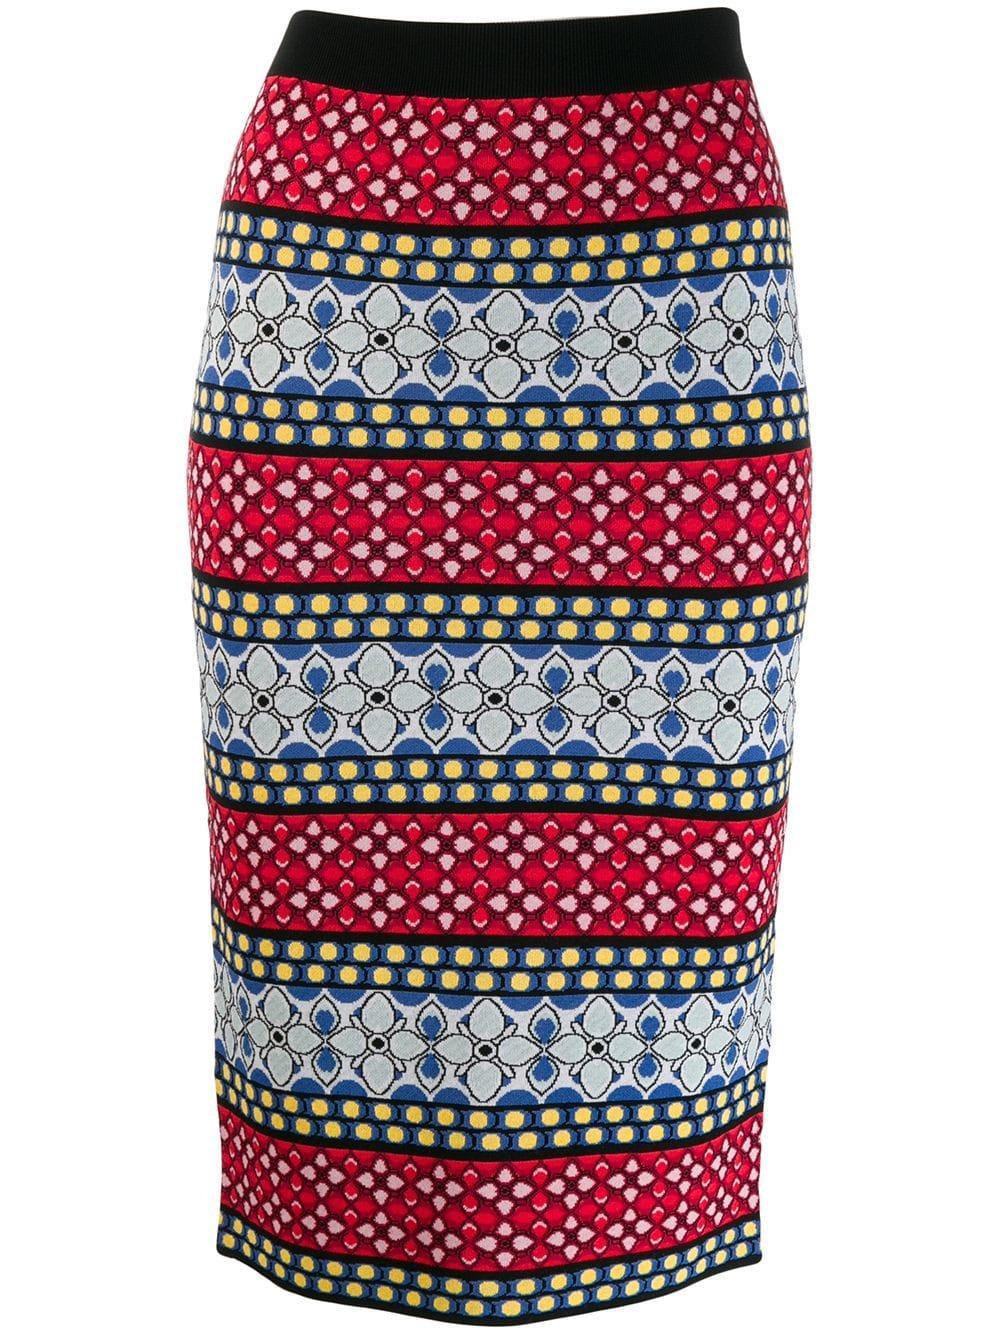 Morena Pencil Skirt Item # CC906S14706